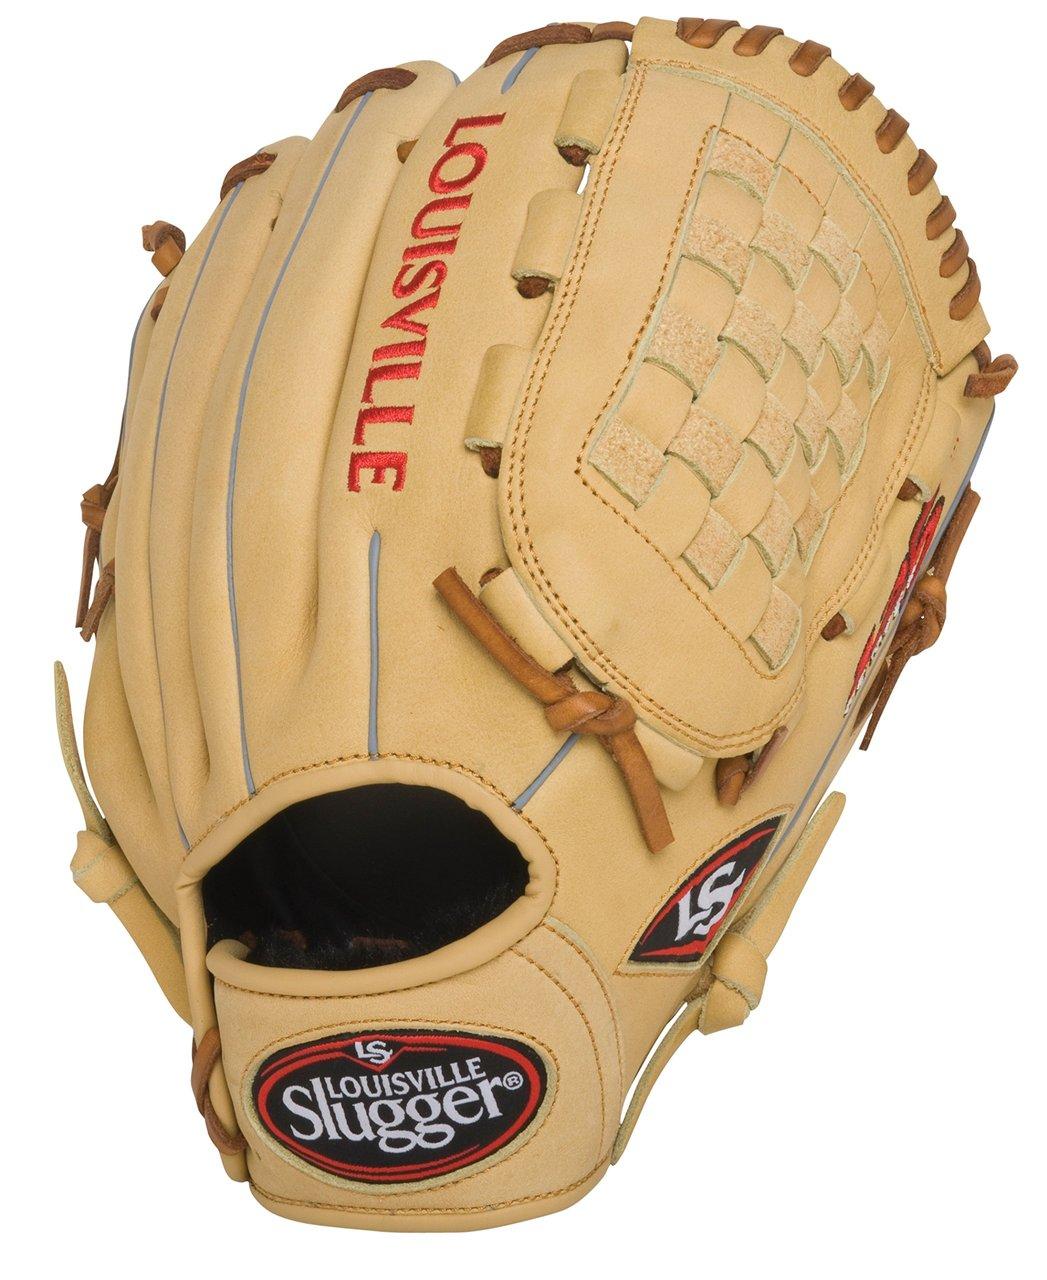 louisville-slugger-125-series-12-inch-baseball-glove-right-handed-throw FG25CR5-1200-Right Handed Throw Louisville Slugger 044277052522 Louisville Slugger 125 Series 12 Inch Baseball Glove model number FG25CR5-1200.